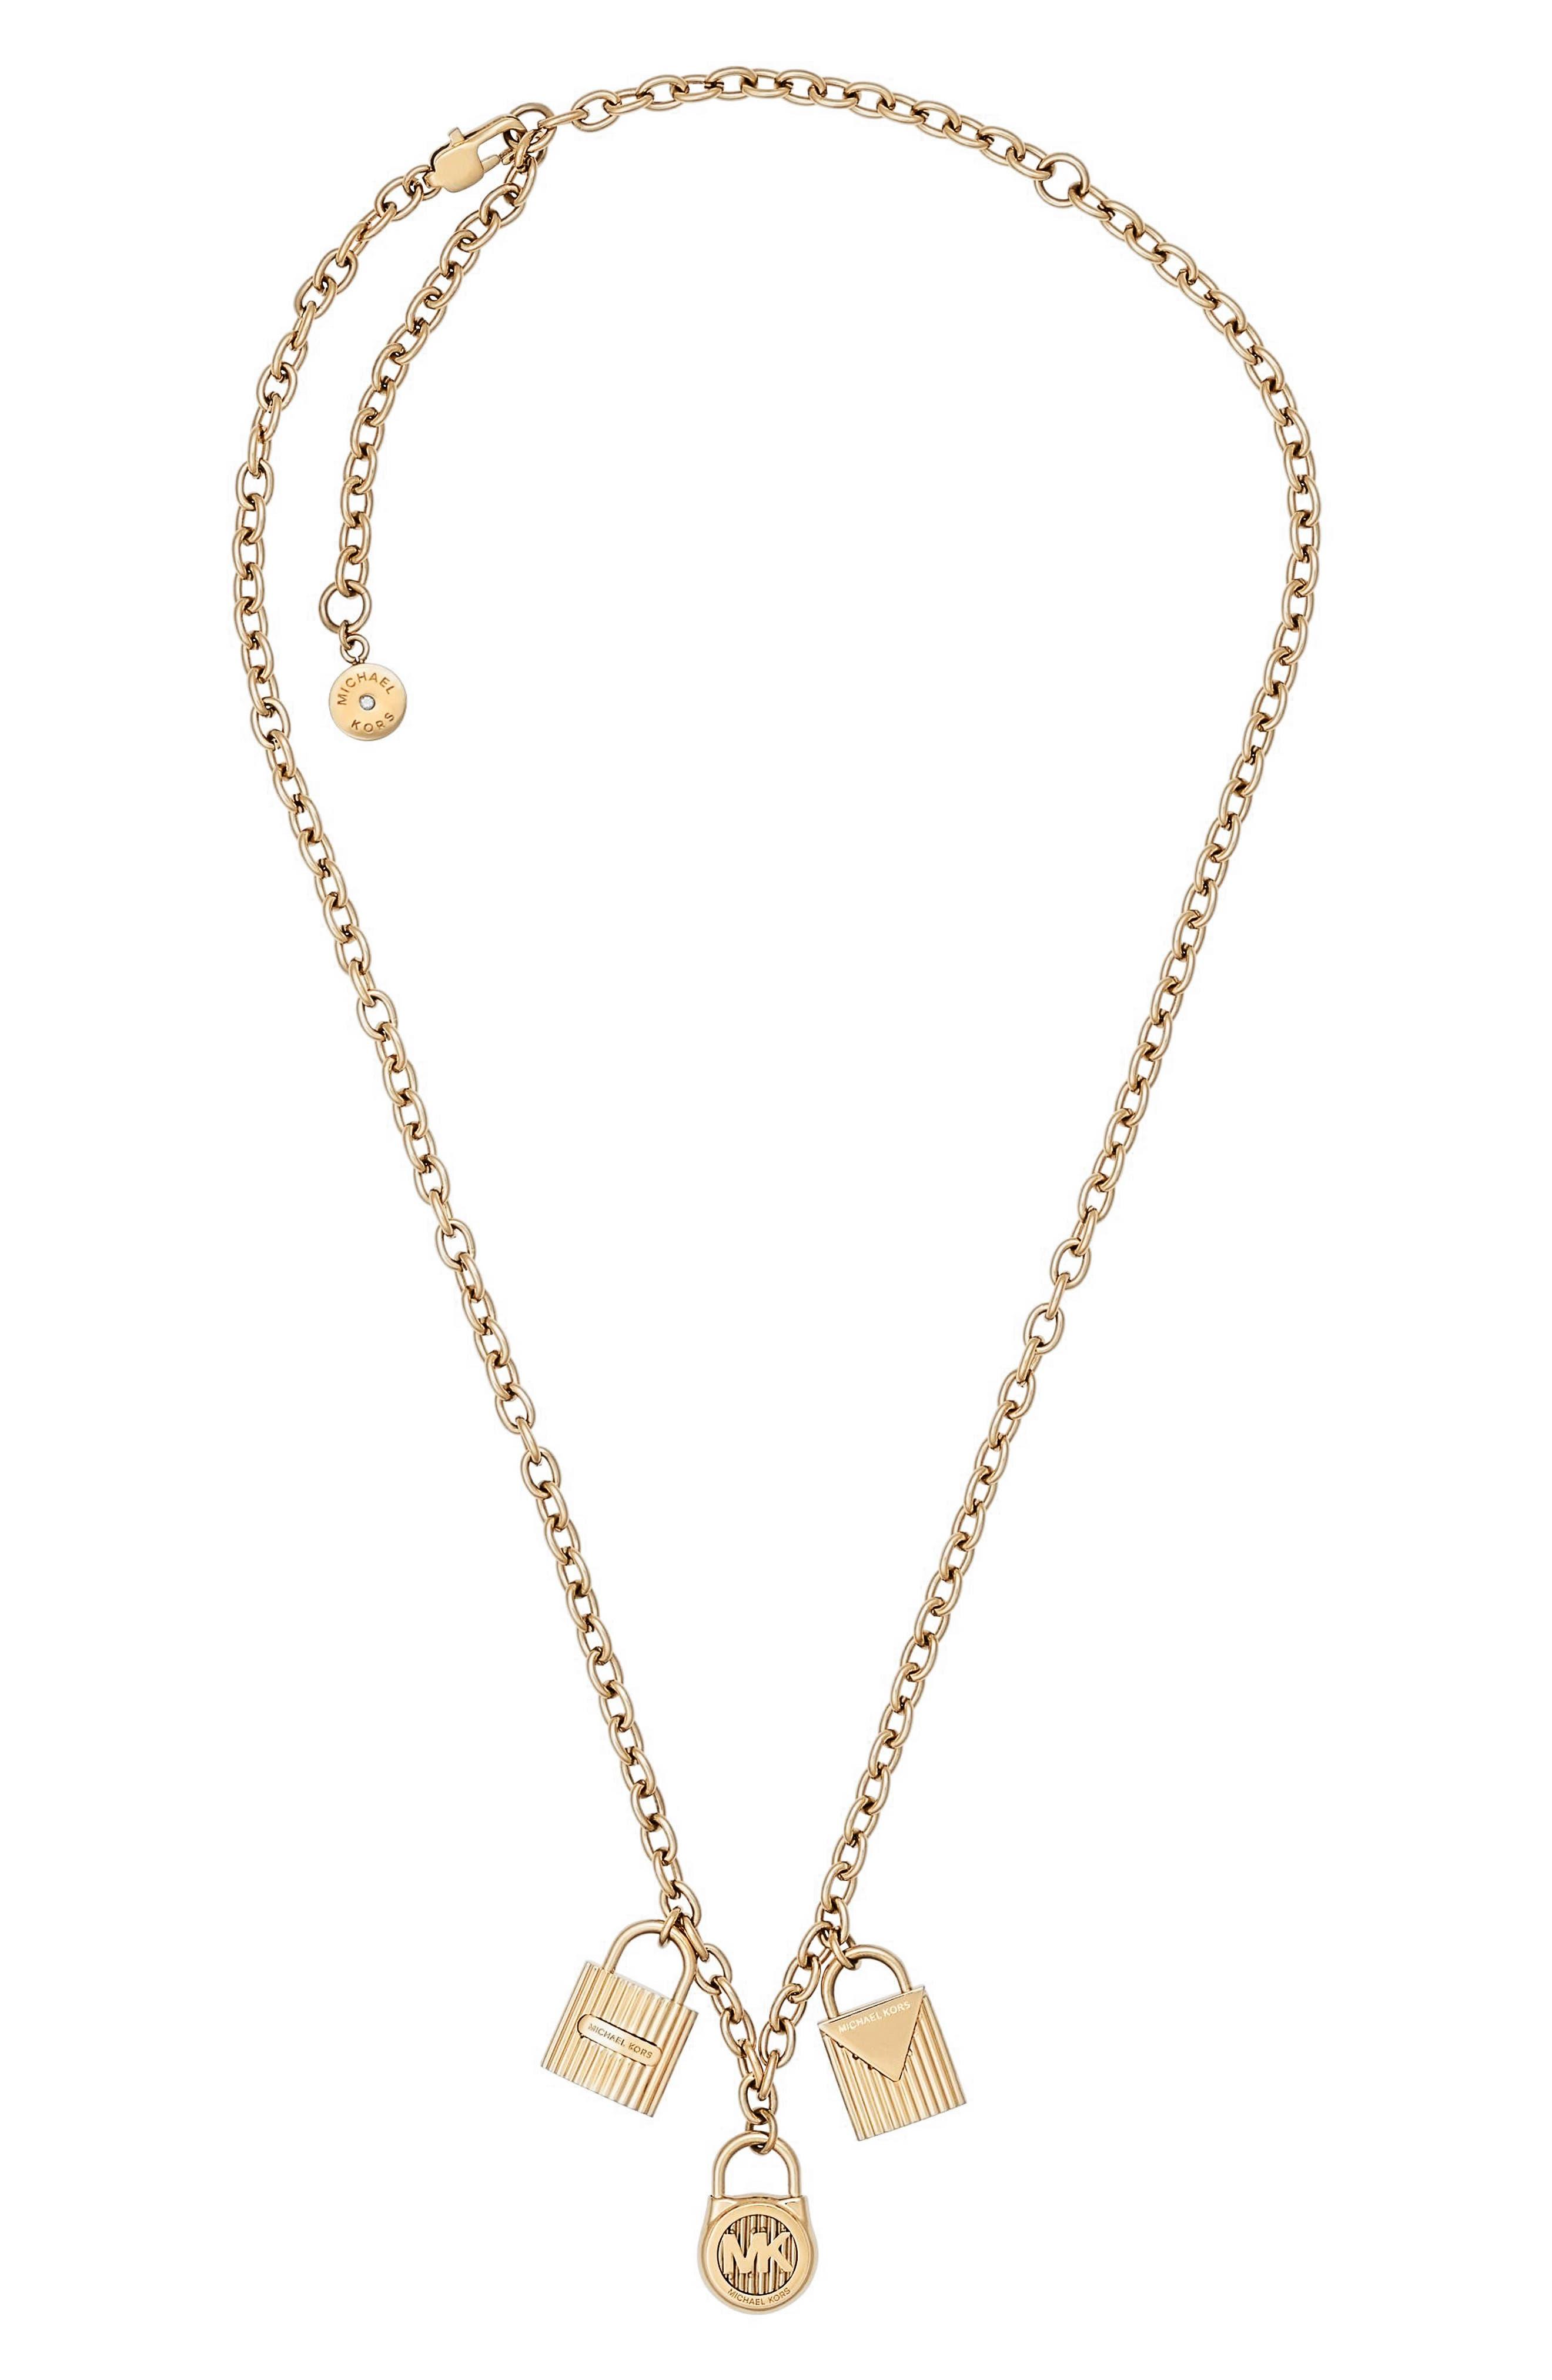 Michael Kors Padlock Charm Pendant Necklace